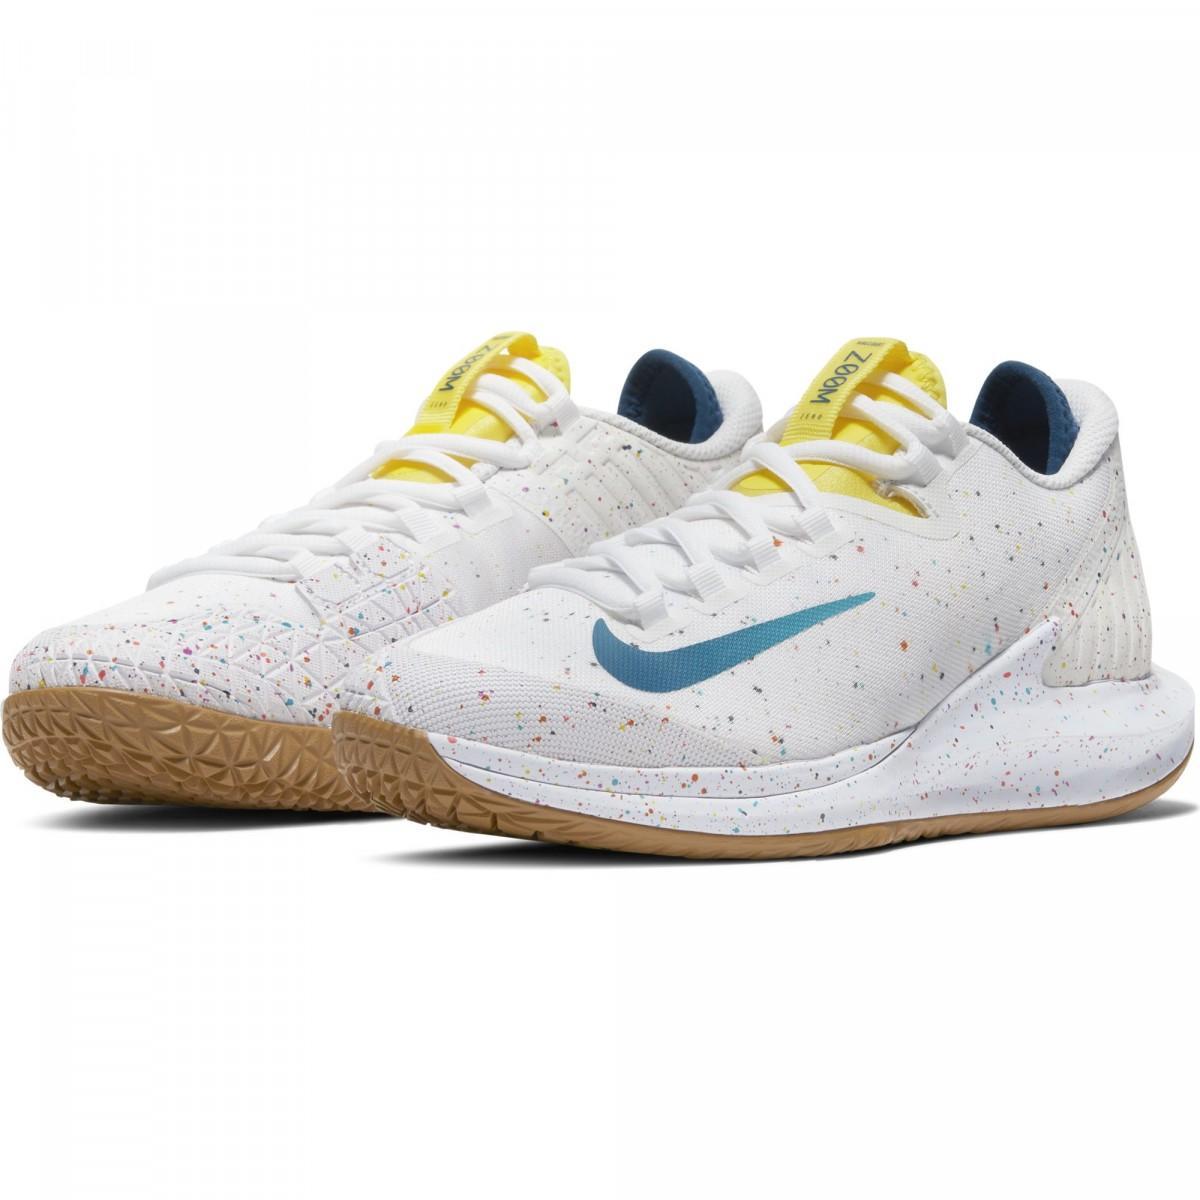 Теннисные кроссовки женские Nike W Court Air Zoom Zero white/valerian blue